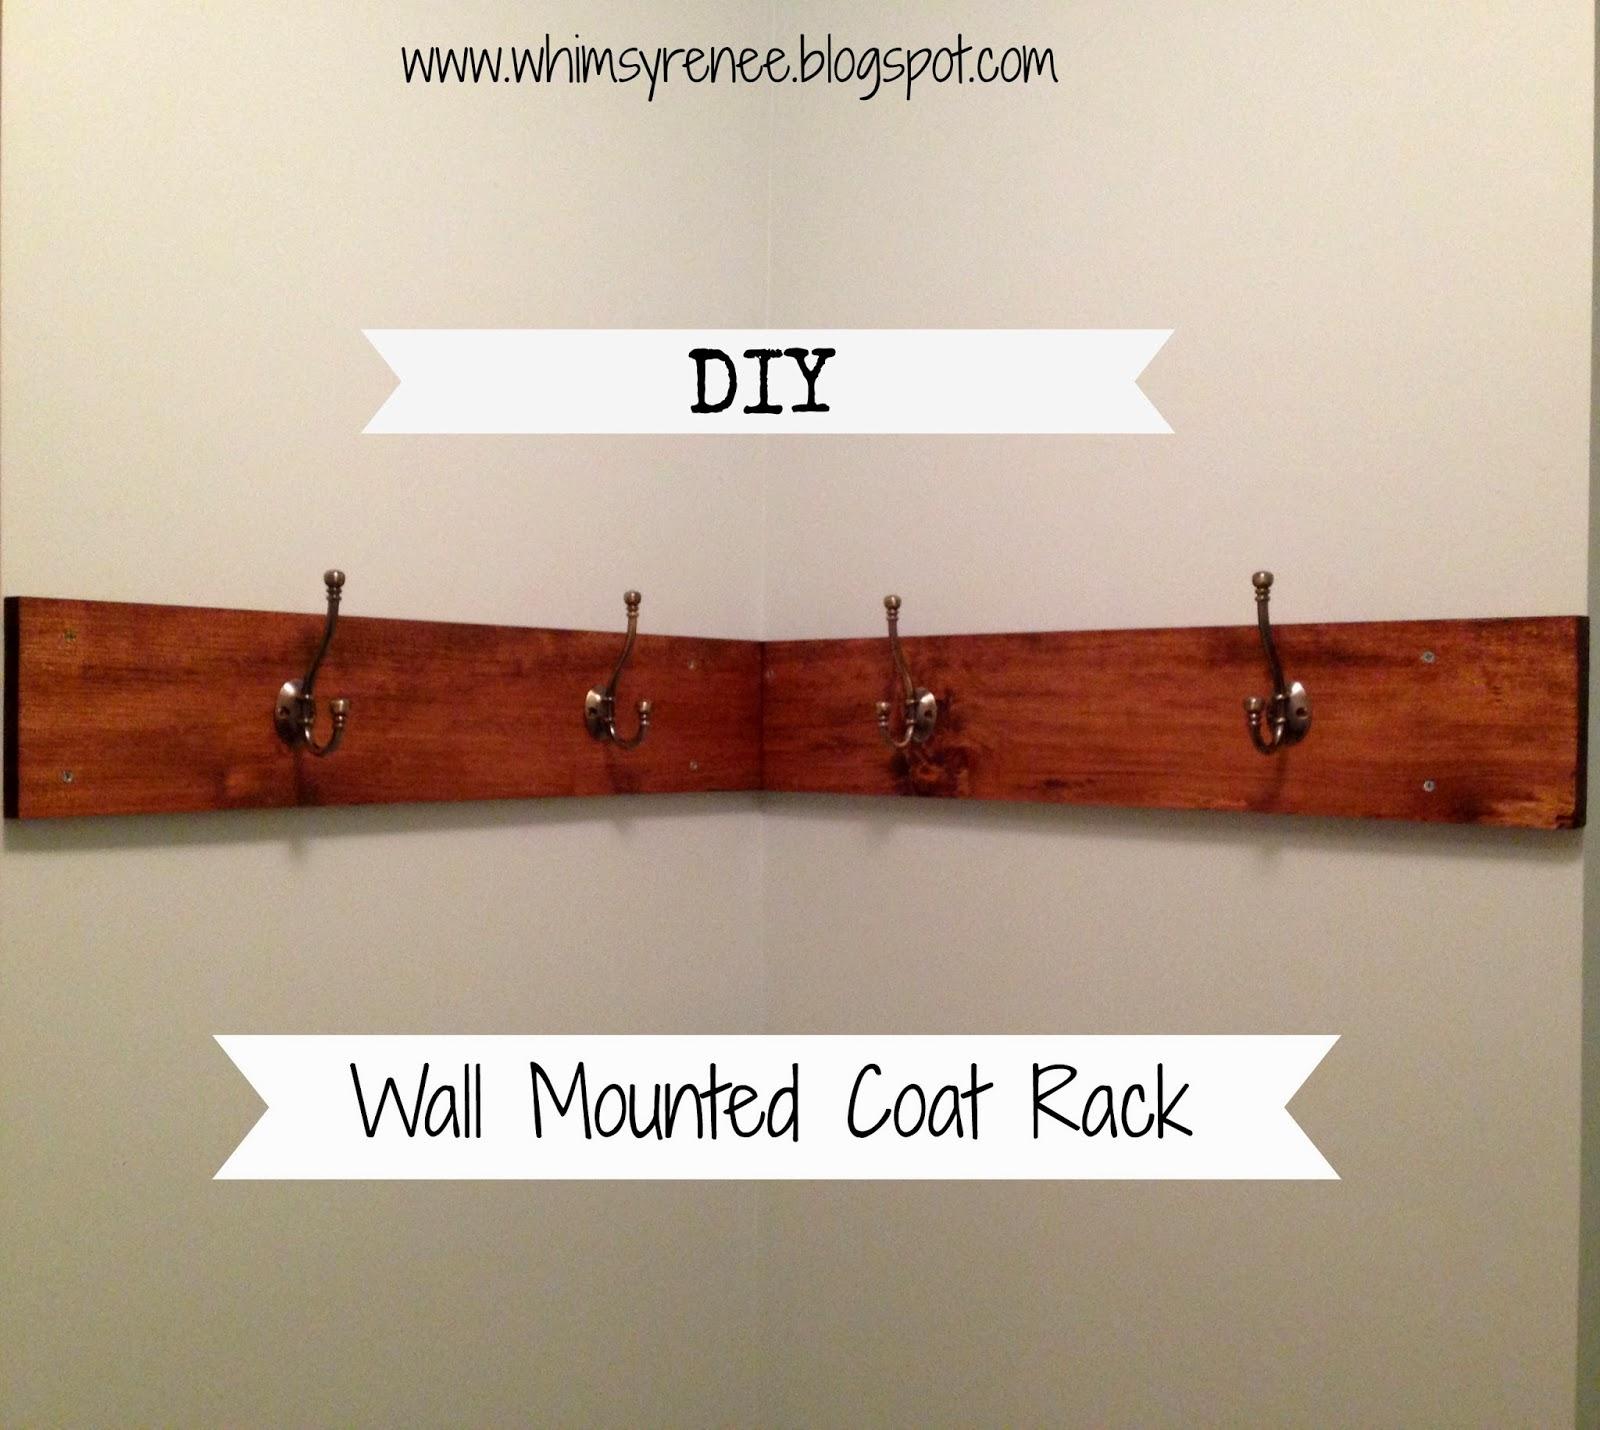 Whimsy Renee Diy Wall Mounted Coat Rack